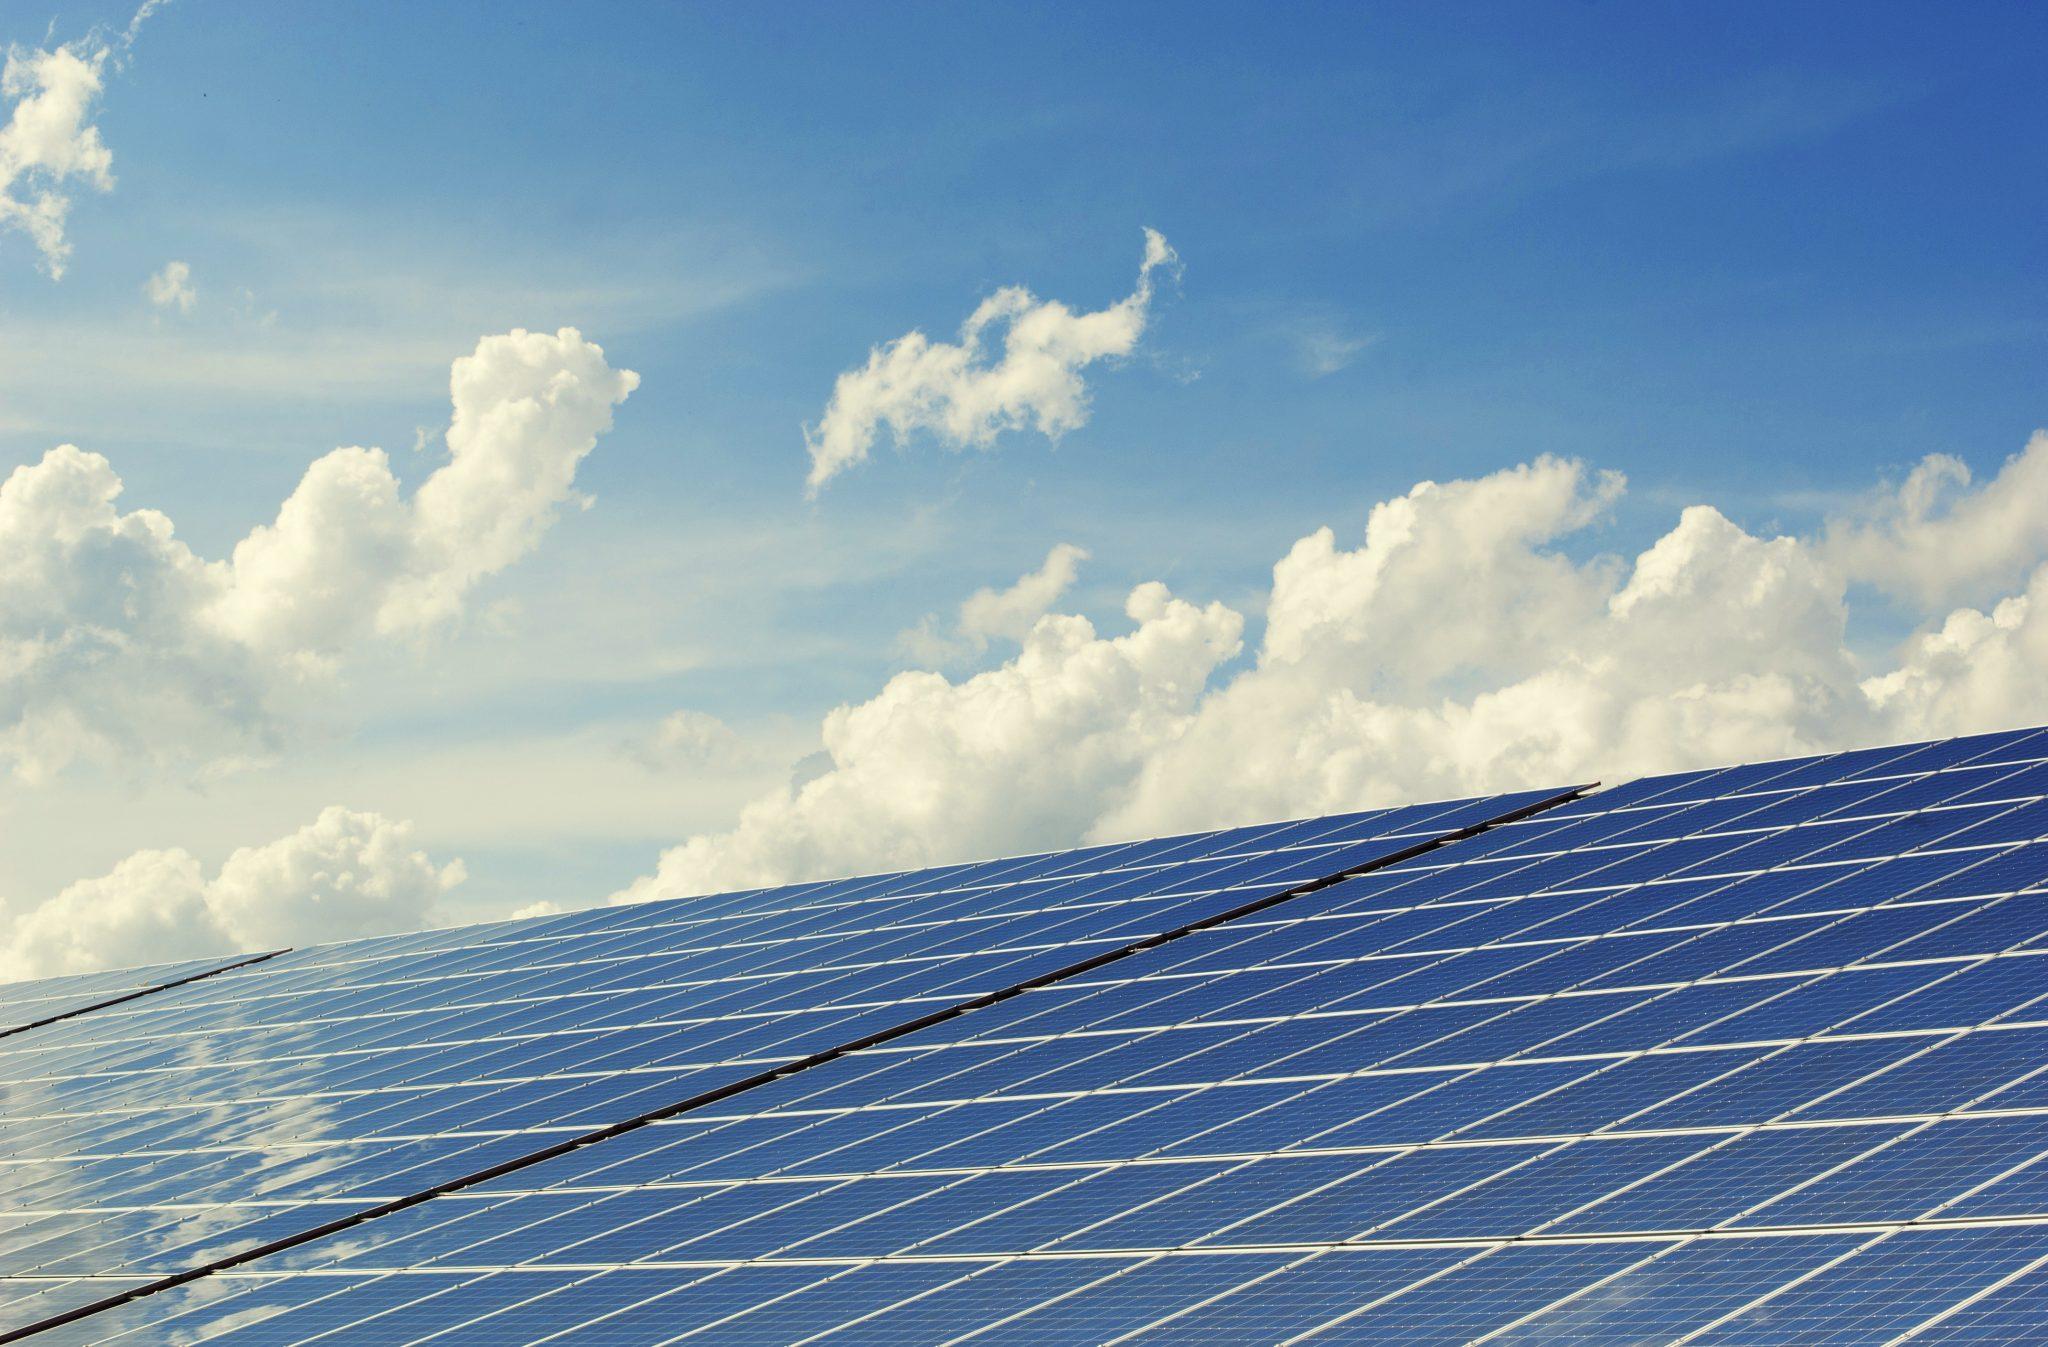 Inspectie zonnepanelen (Scope 12)